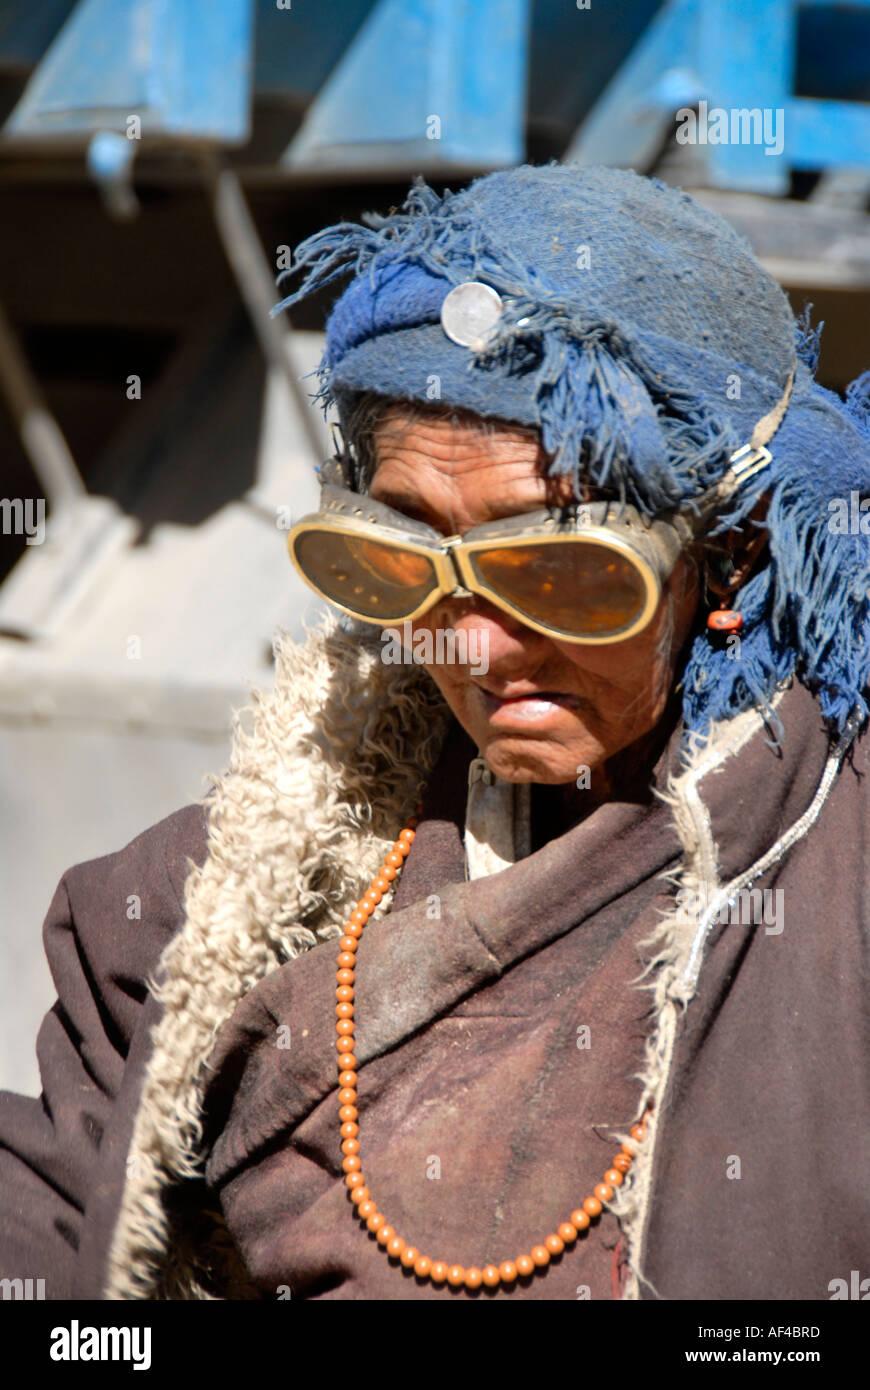 Mujeres Inusual E Inconveniente Tibetano Gafas Lleva Paños Peregrino lc3KTF1J